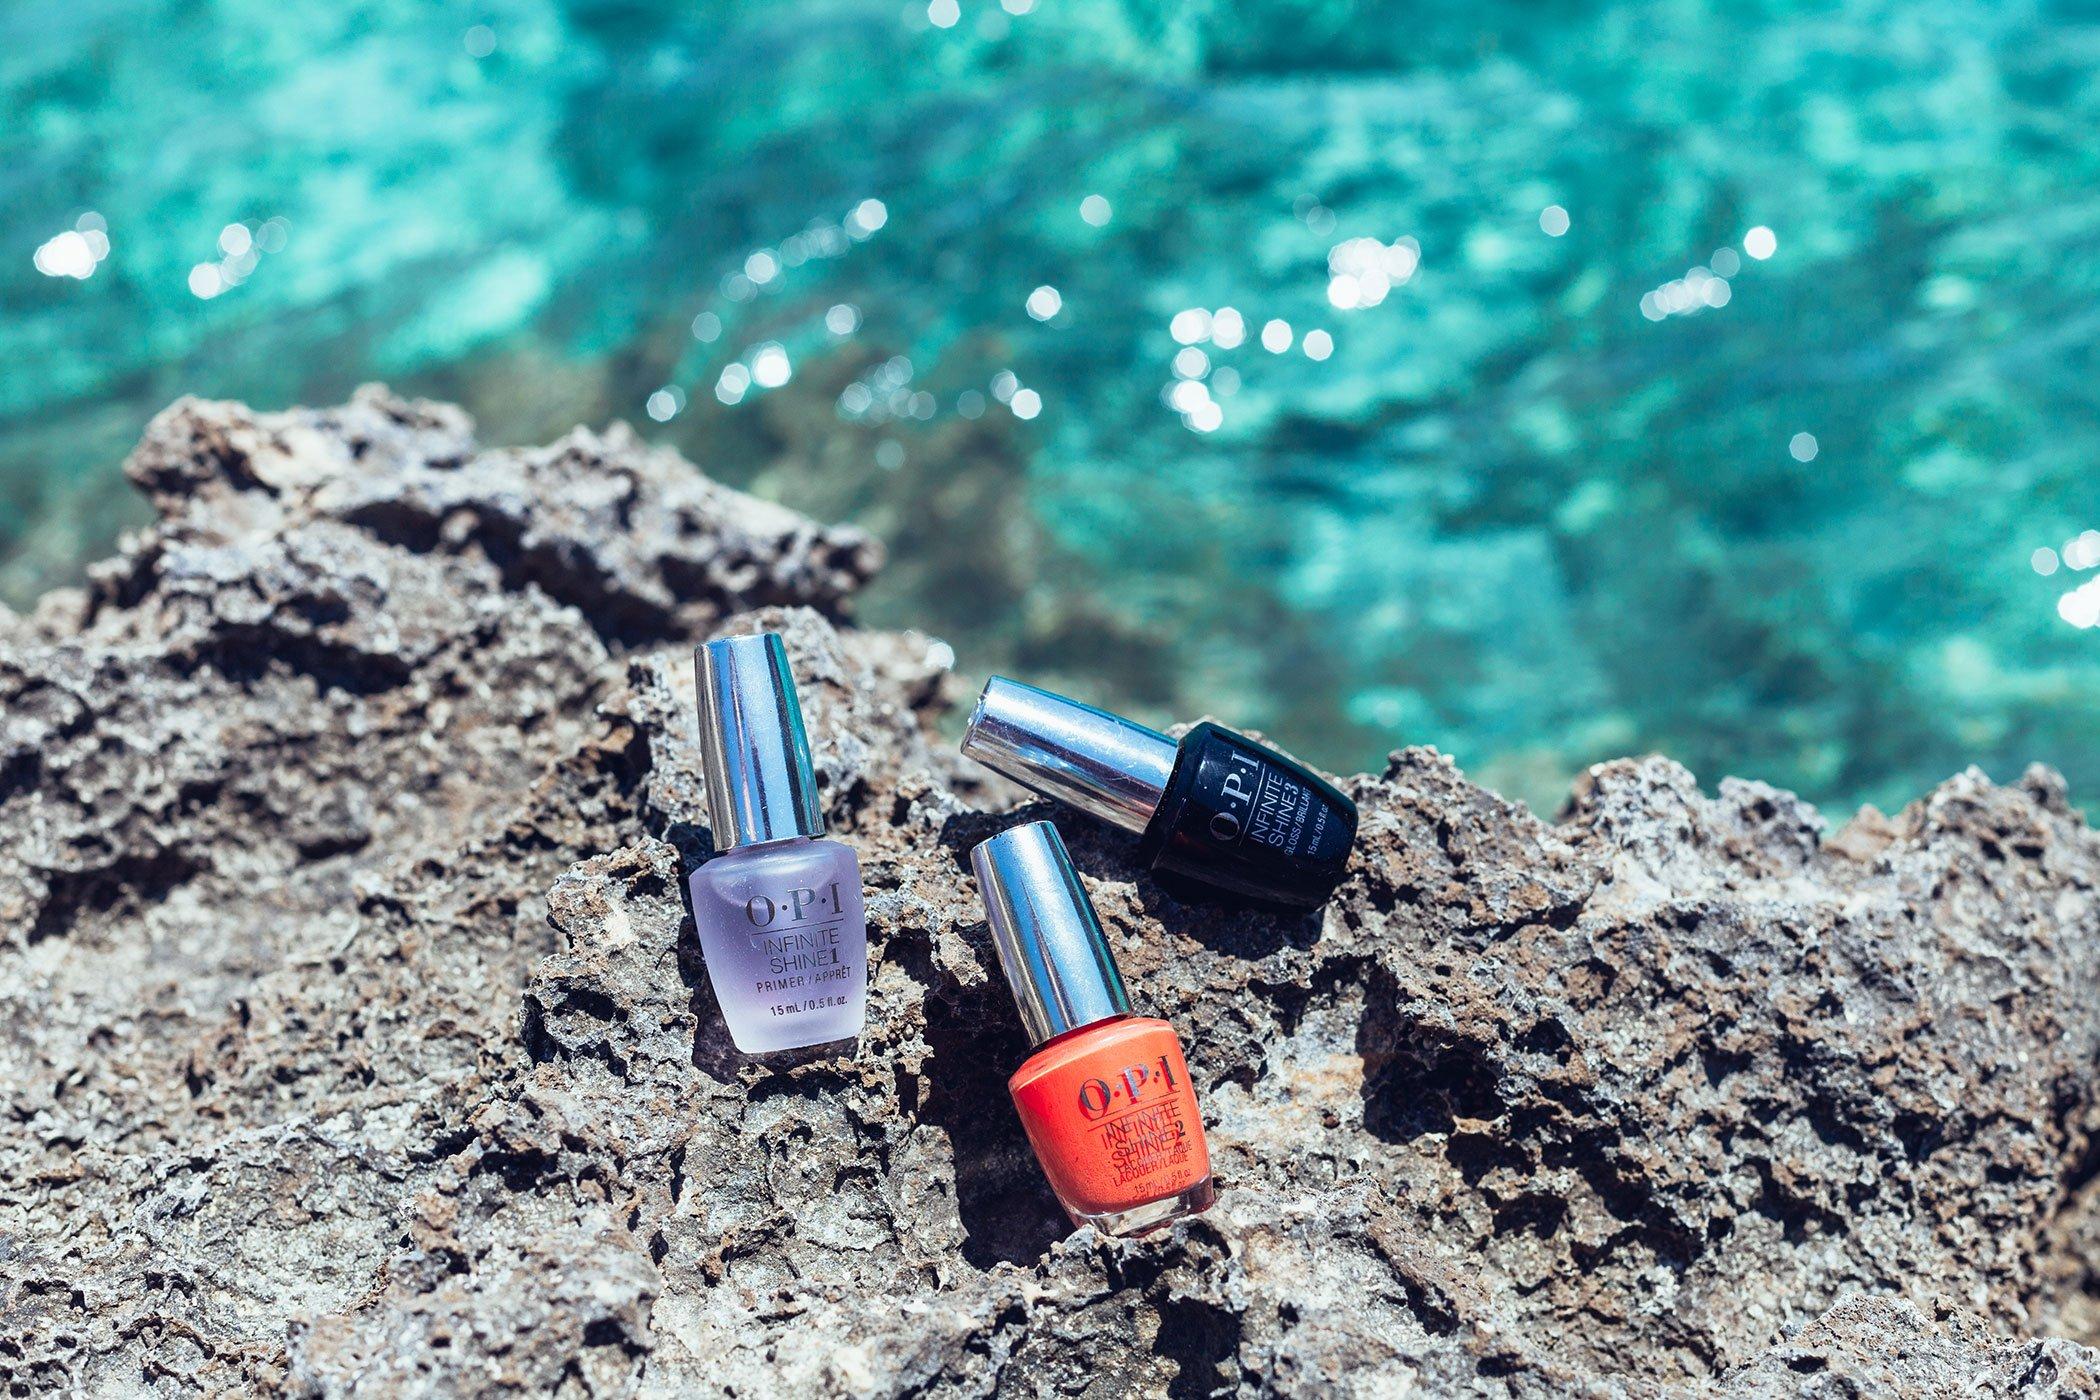 mikutas beauty products